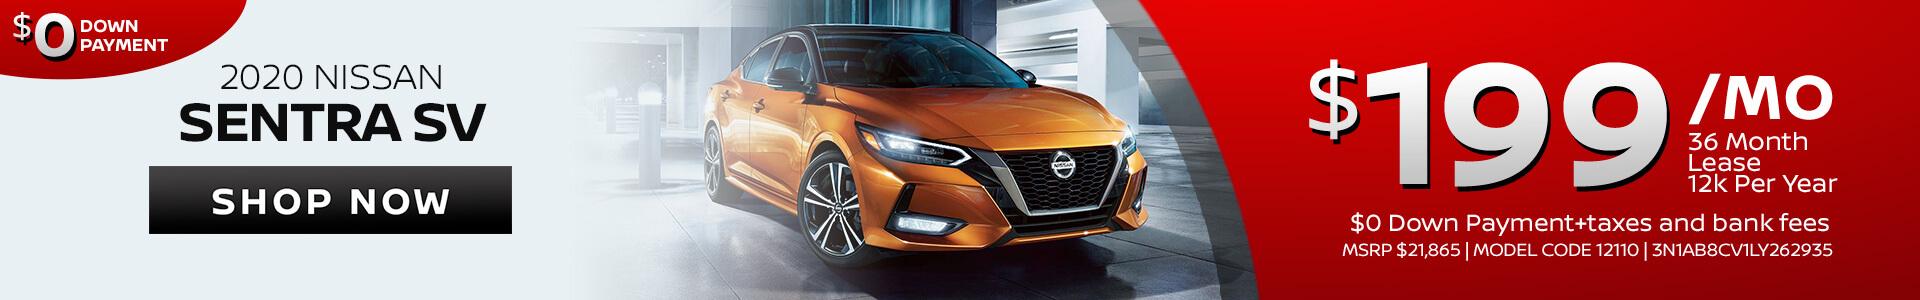 Nissan Sentra $199 Lease